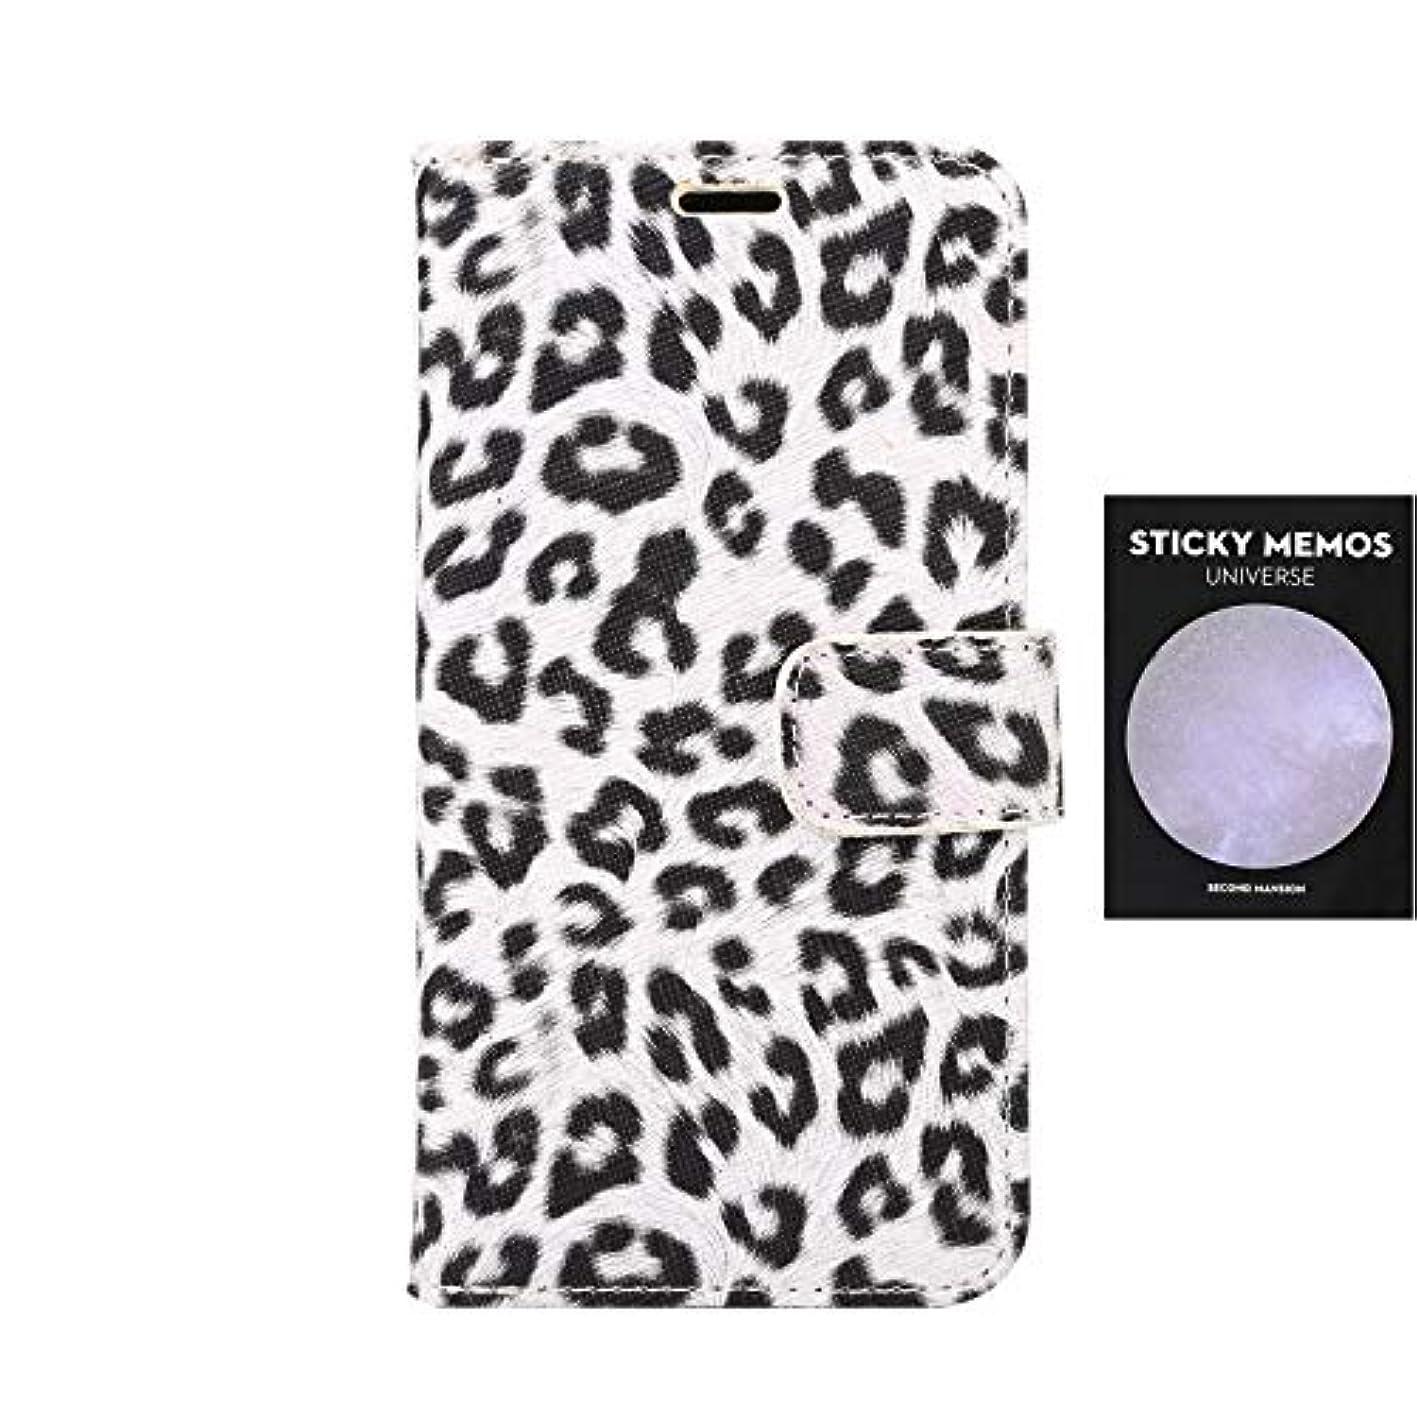 iPhone X ケース 対応 本革 レザー手帳型スマホケース カバー 財布型 機能 耐摩擦 耐汚れ カードポケット 全面保護 人気 [無料付箋付き]